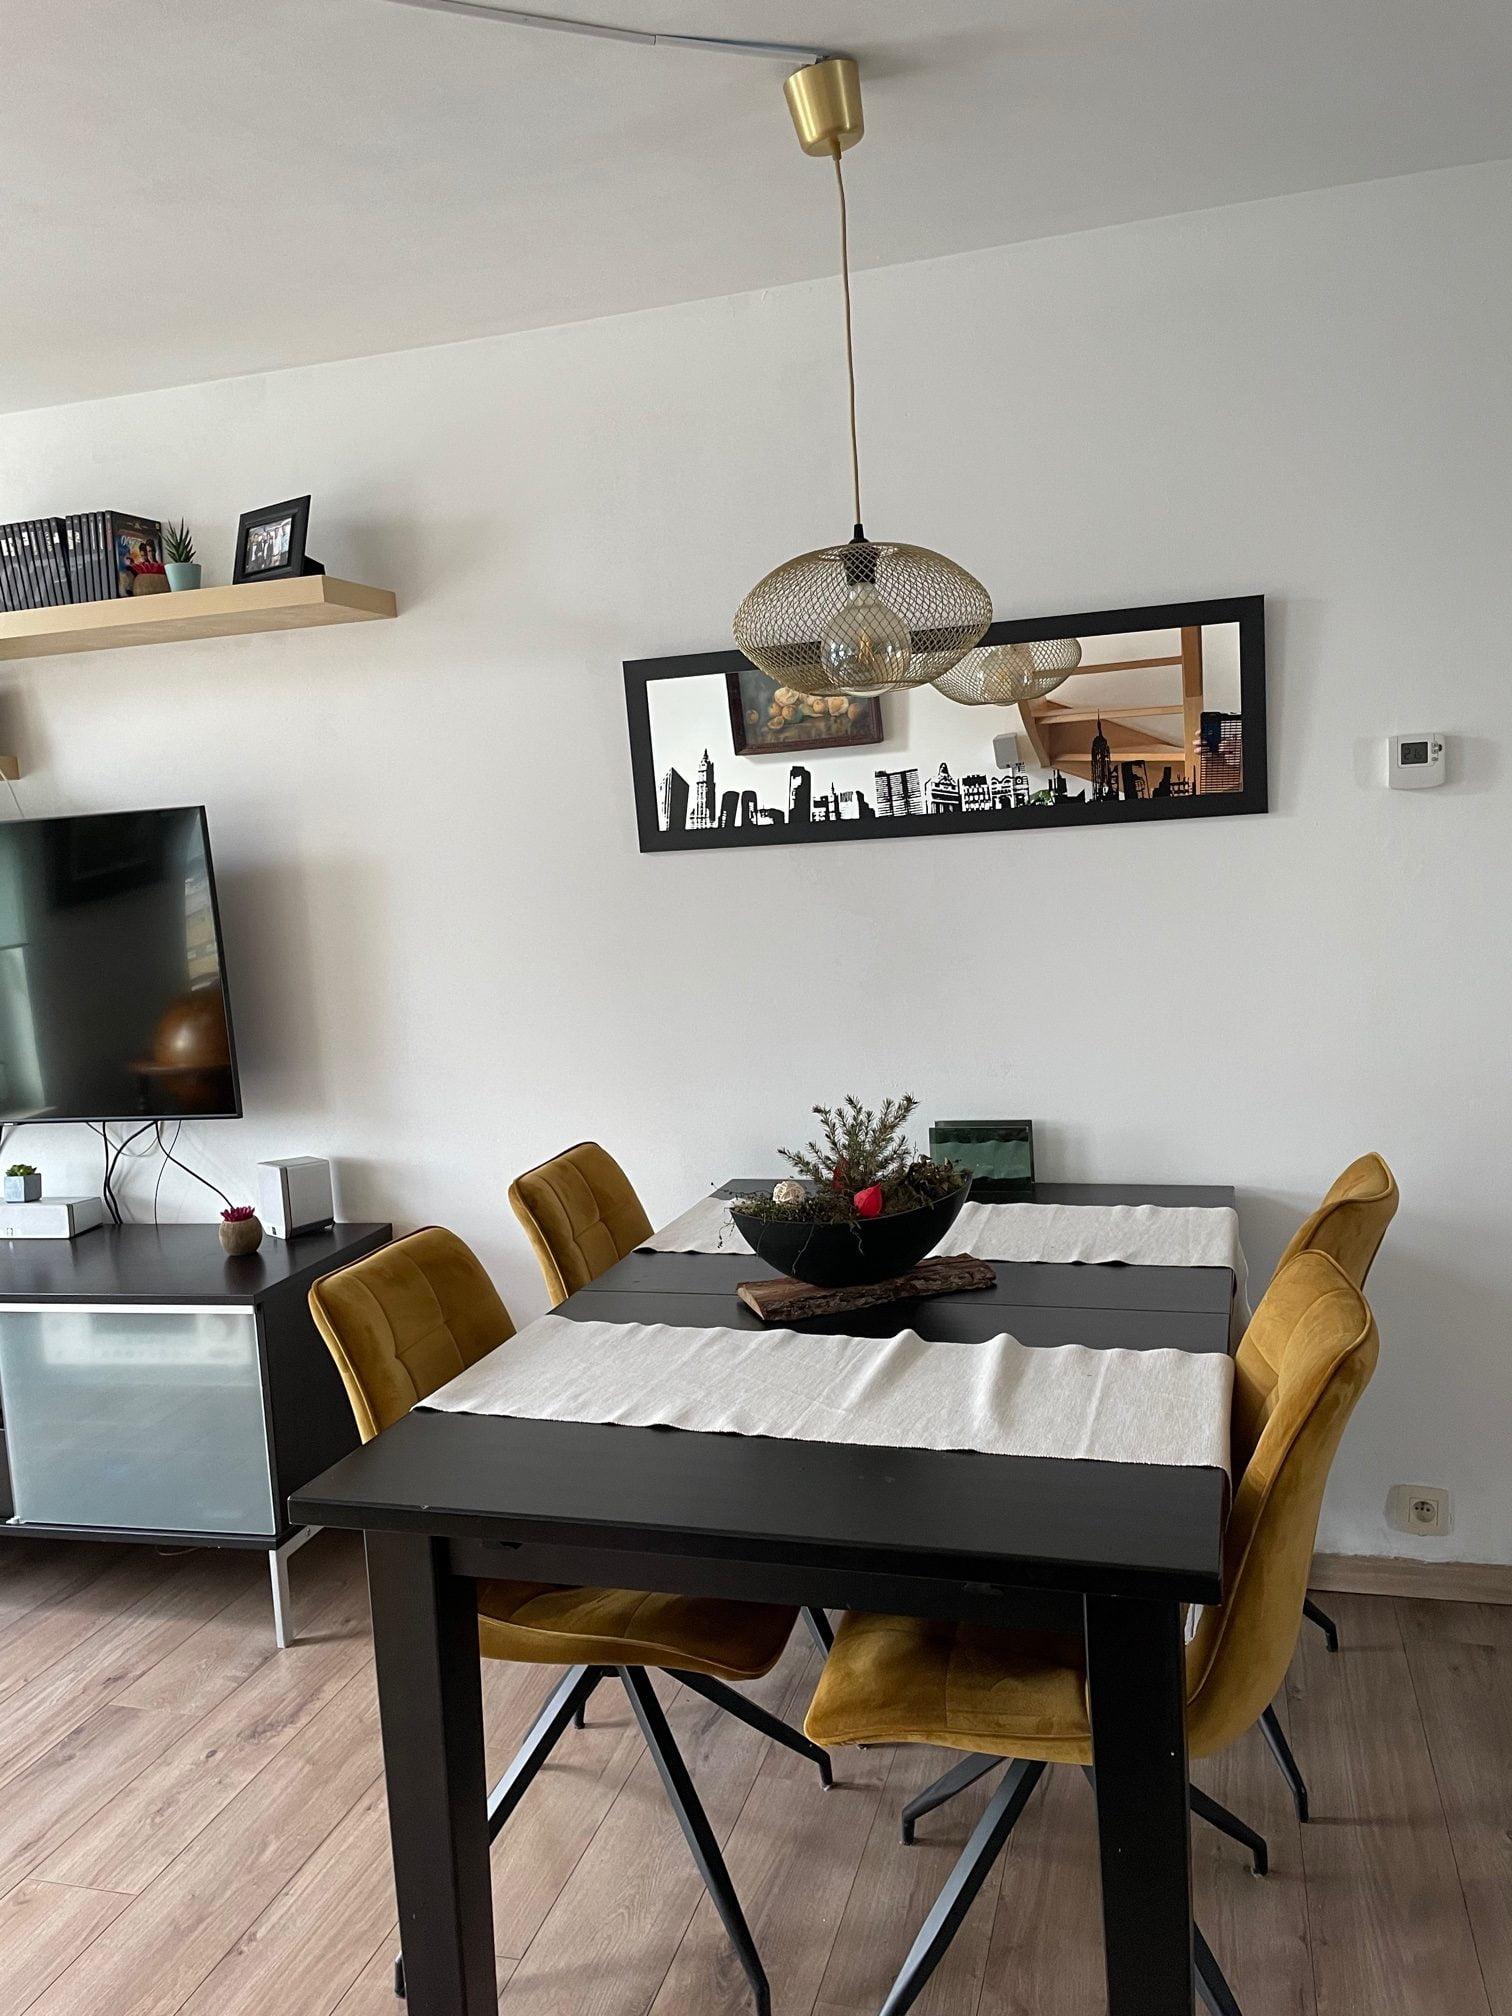 South Duplex - Prime expat rental apartment in Antwerp